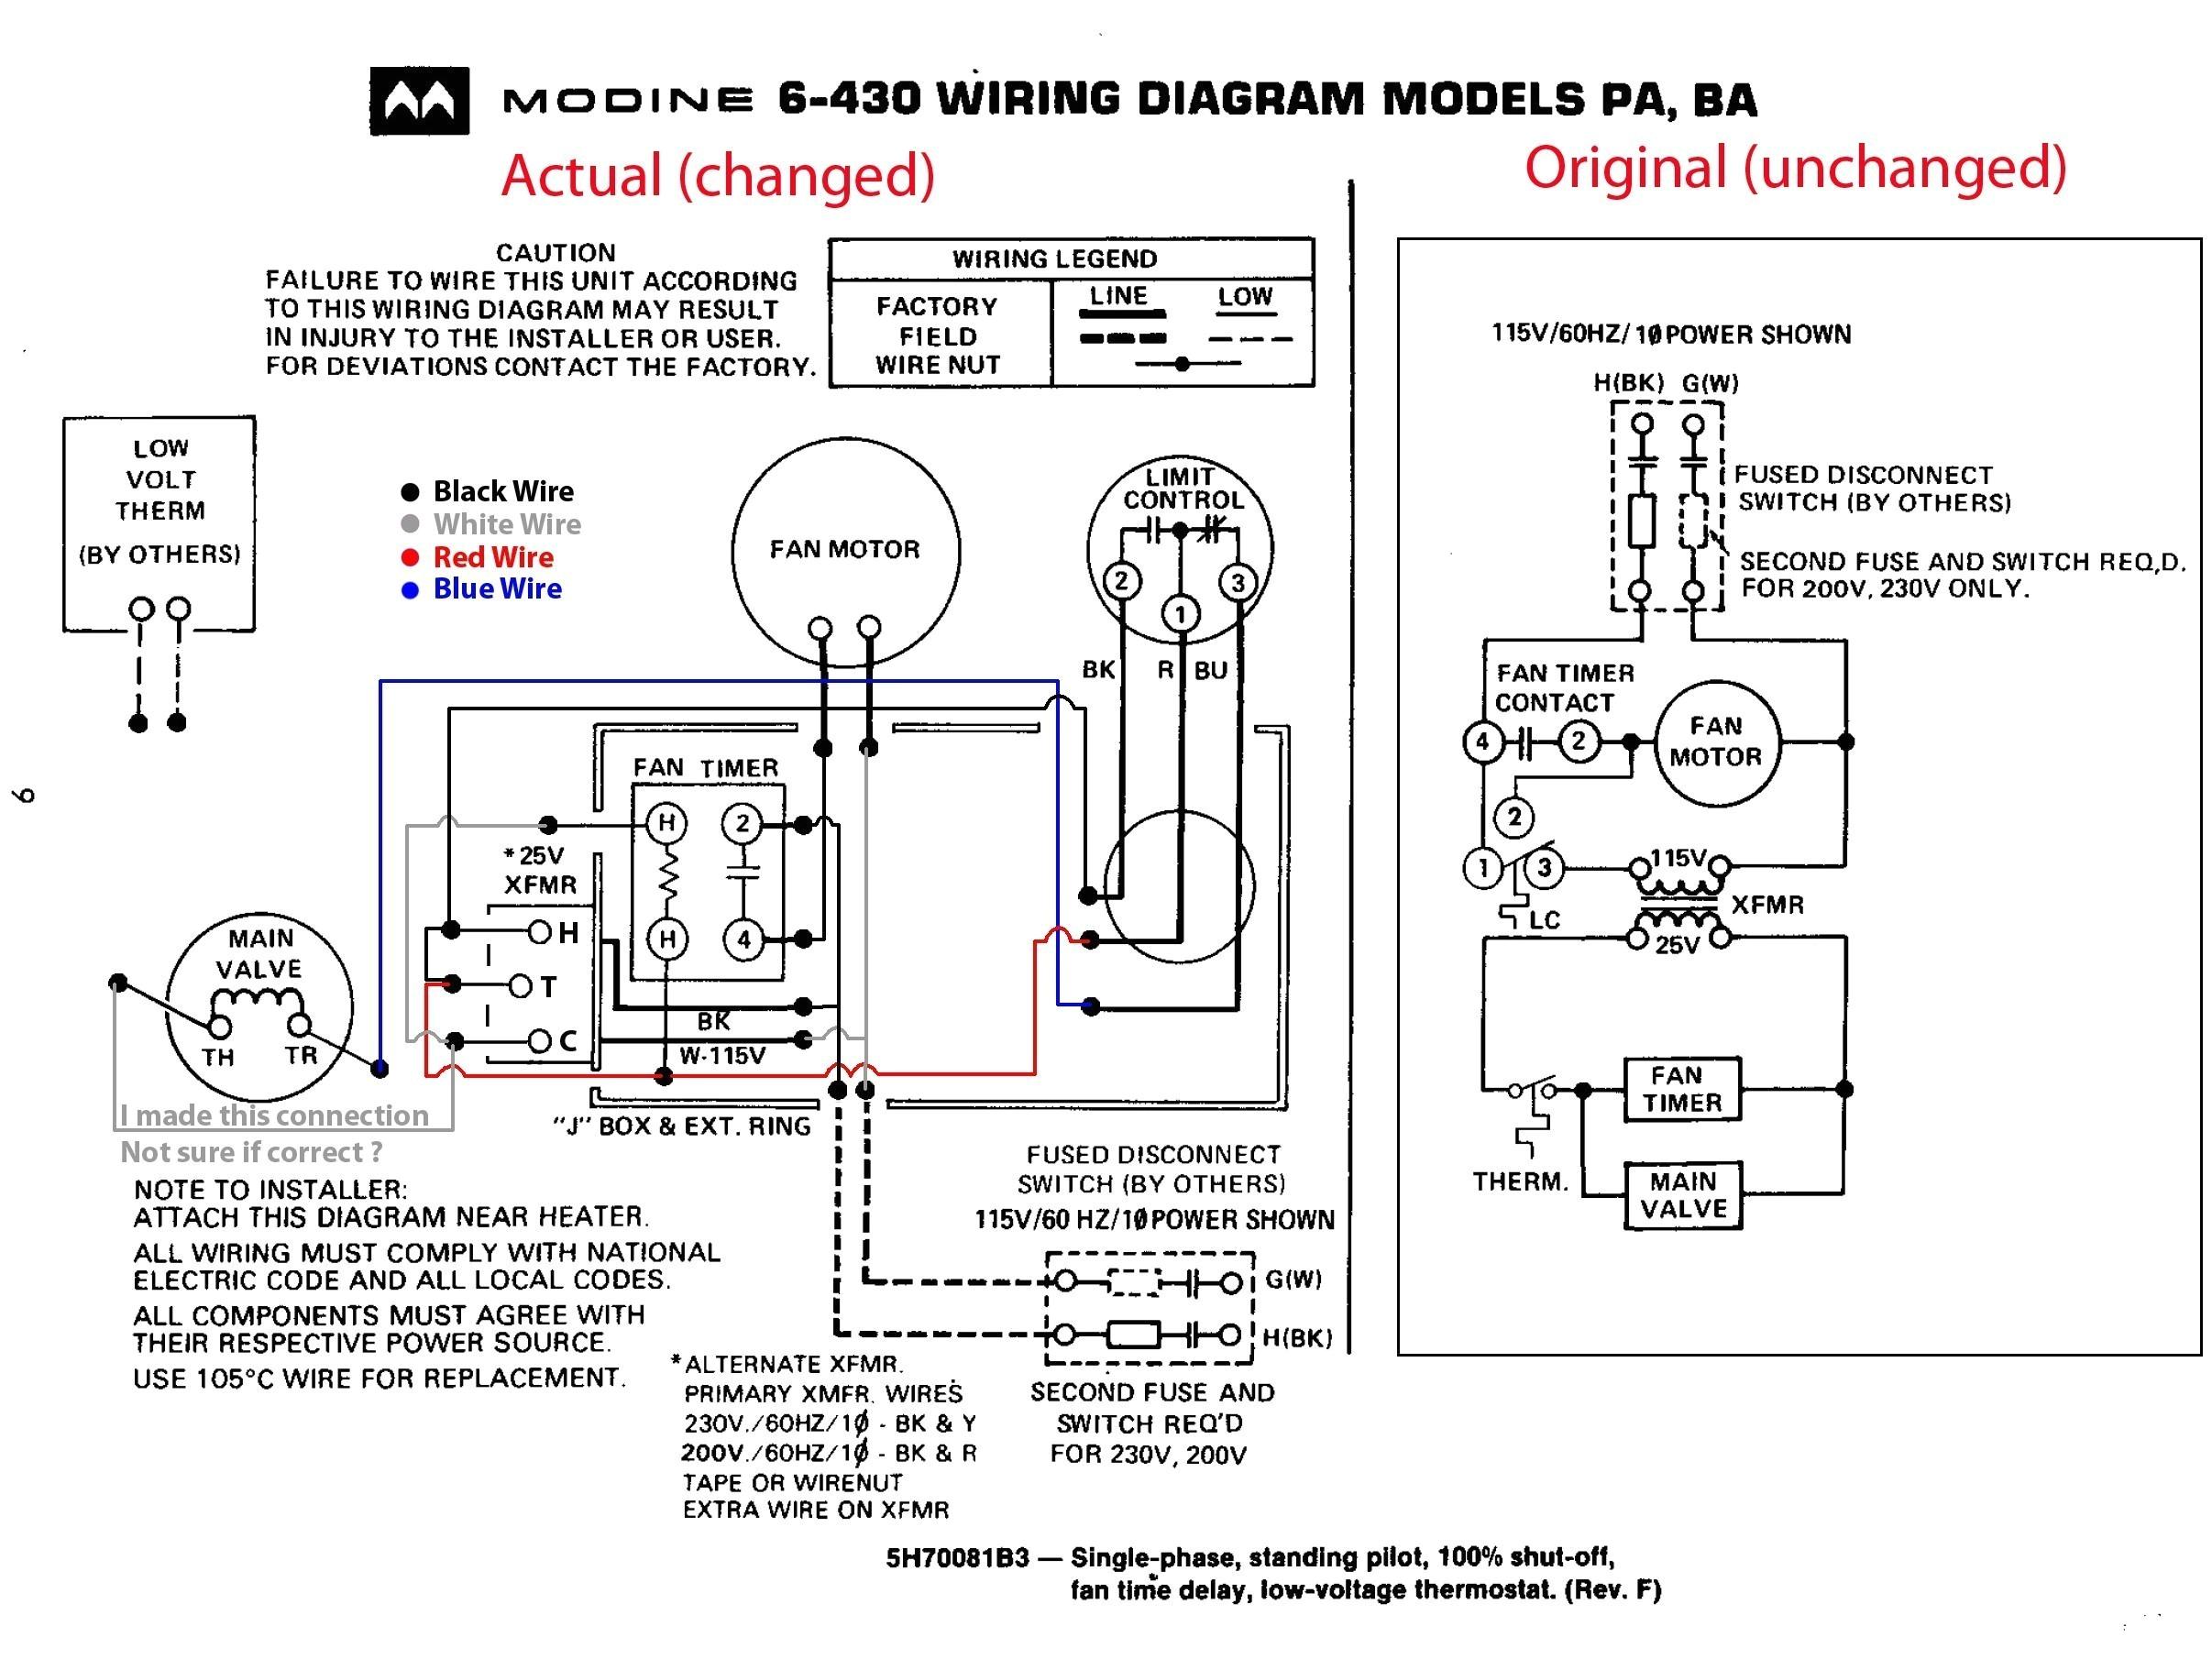 mars wiring diagram wiring diagram toolboxmars time delay relay wiring diagram wiring diagram query mars 10585